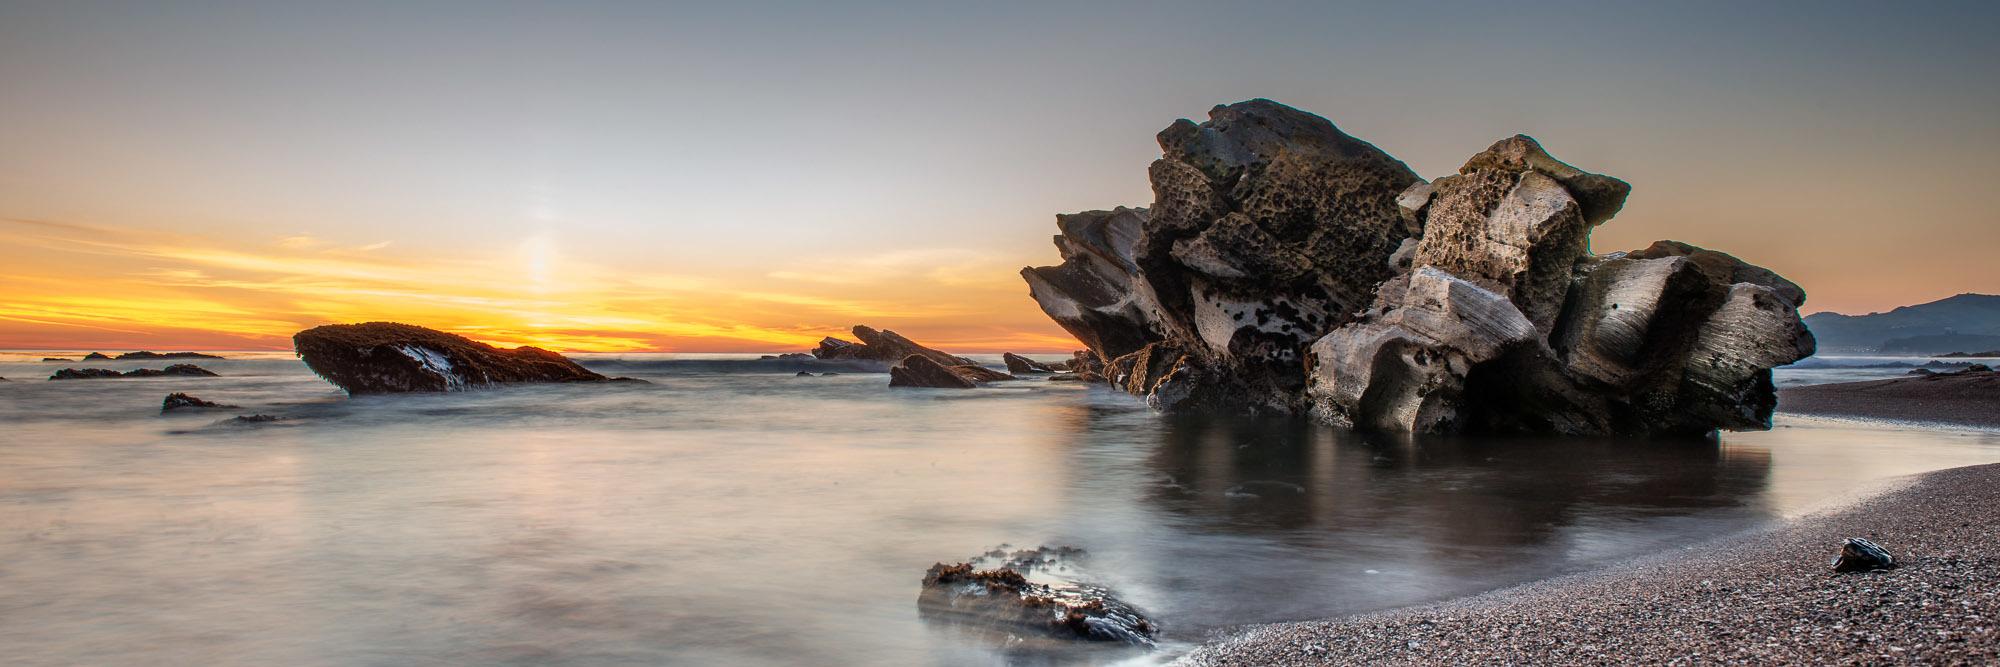 20130118_Shell Beach_3494_Edit-2.jpg